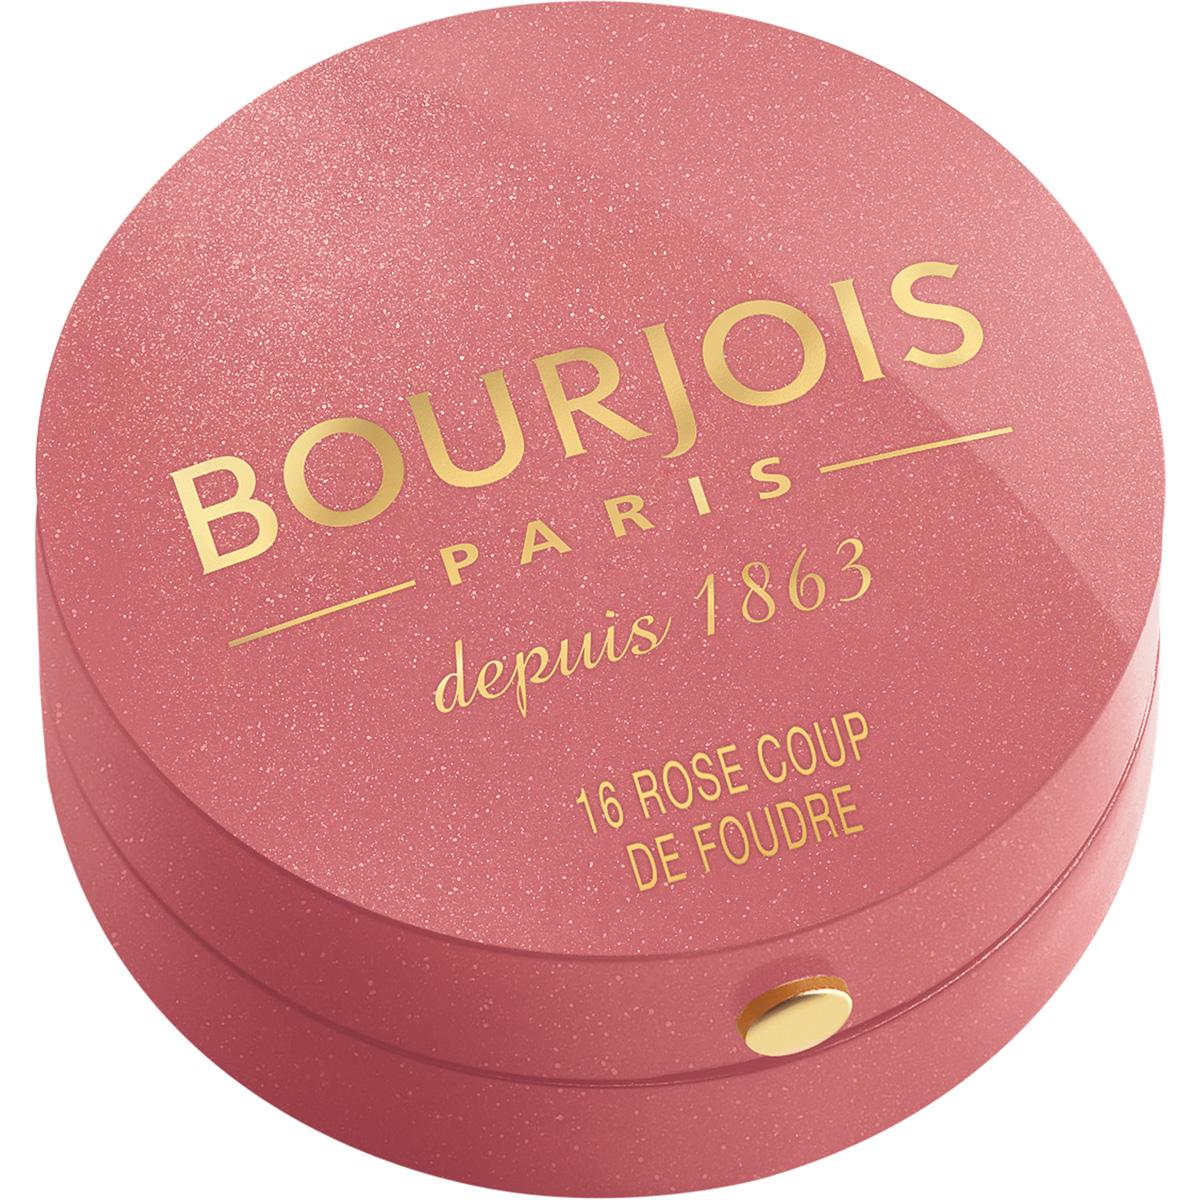 Bourjois Румяна blush 16 тон 2 мл